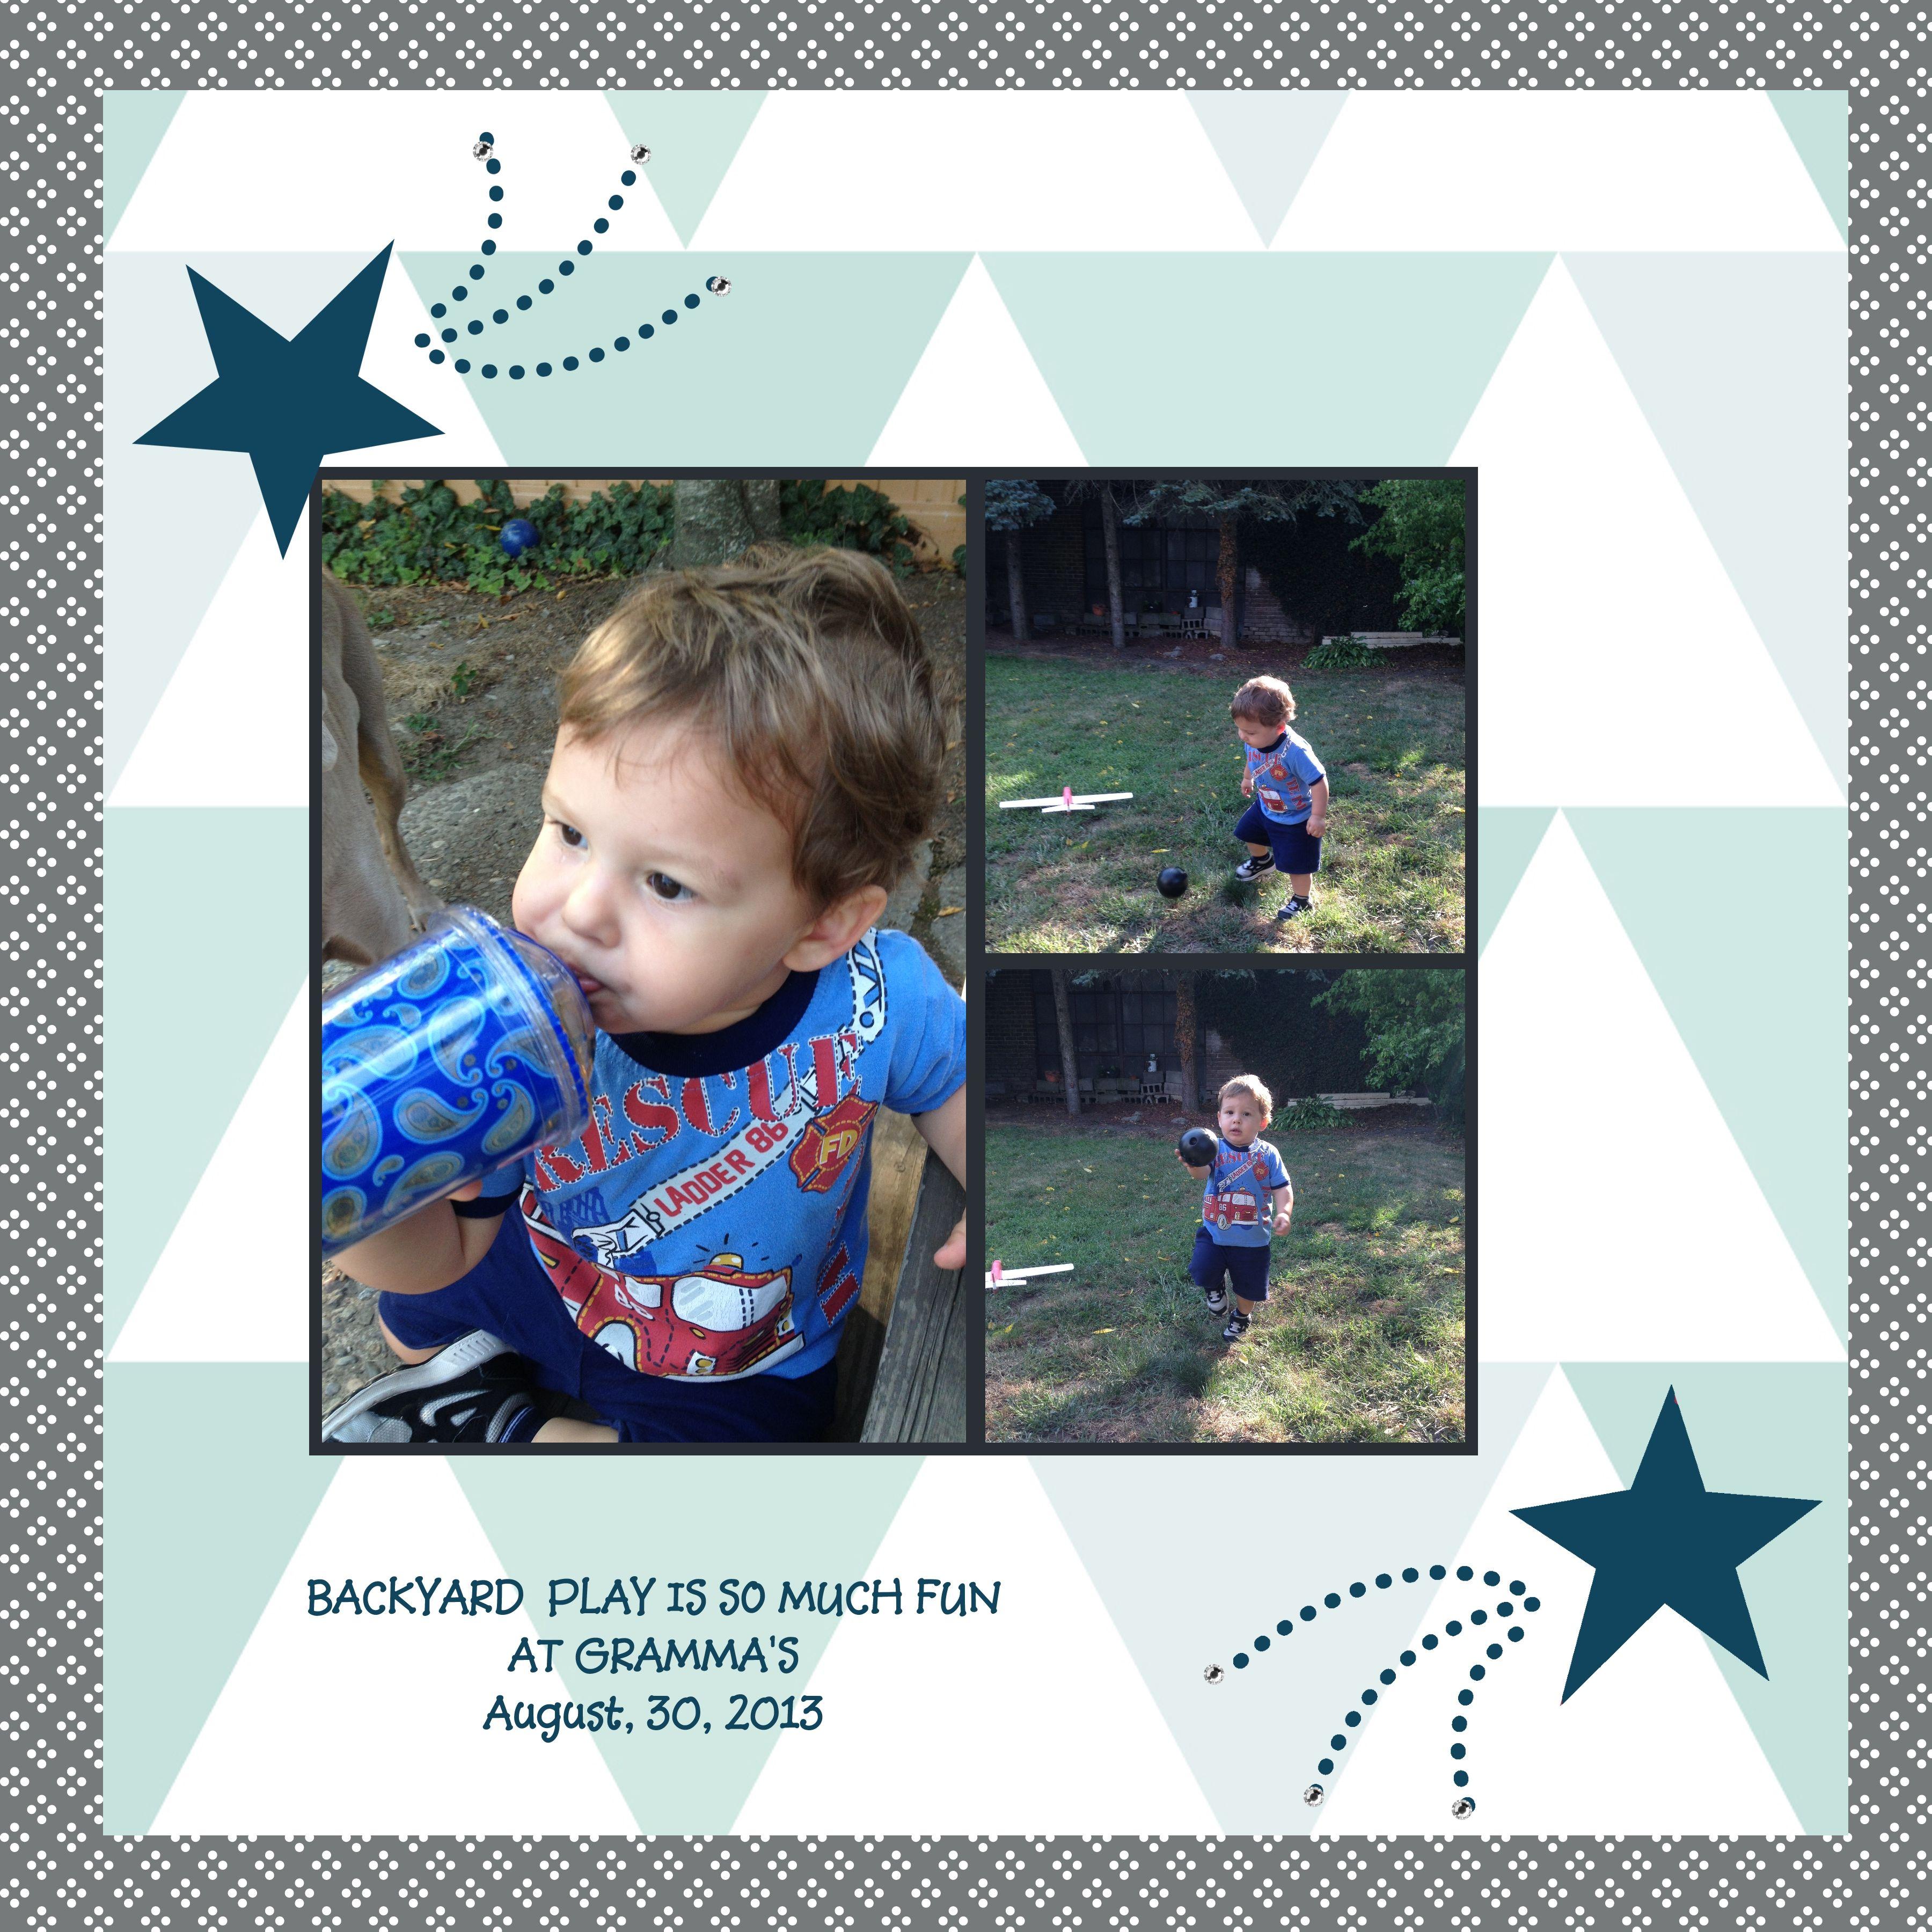 He's a STAR in my book!